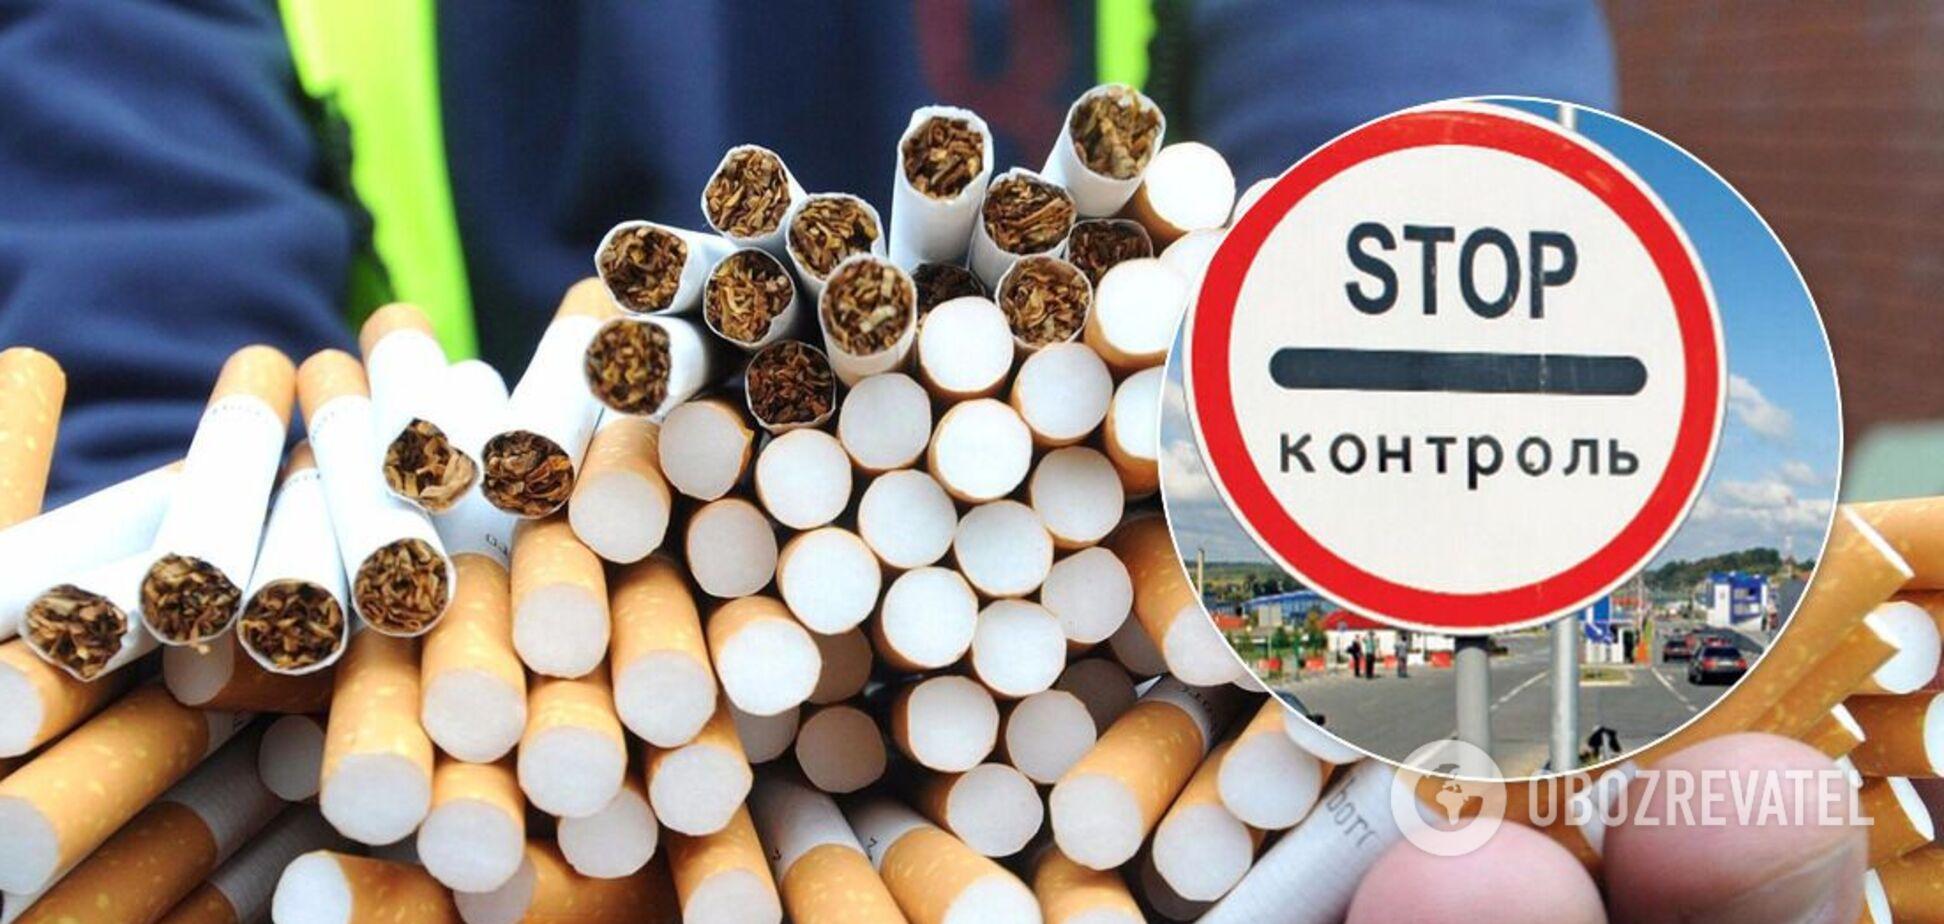 Контрабанда цигарок